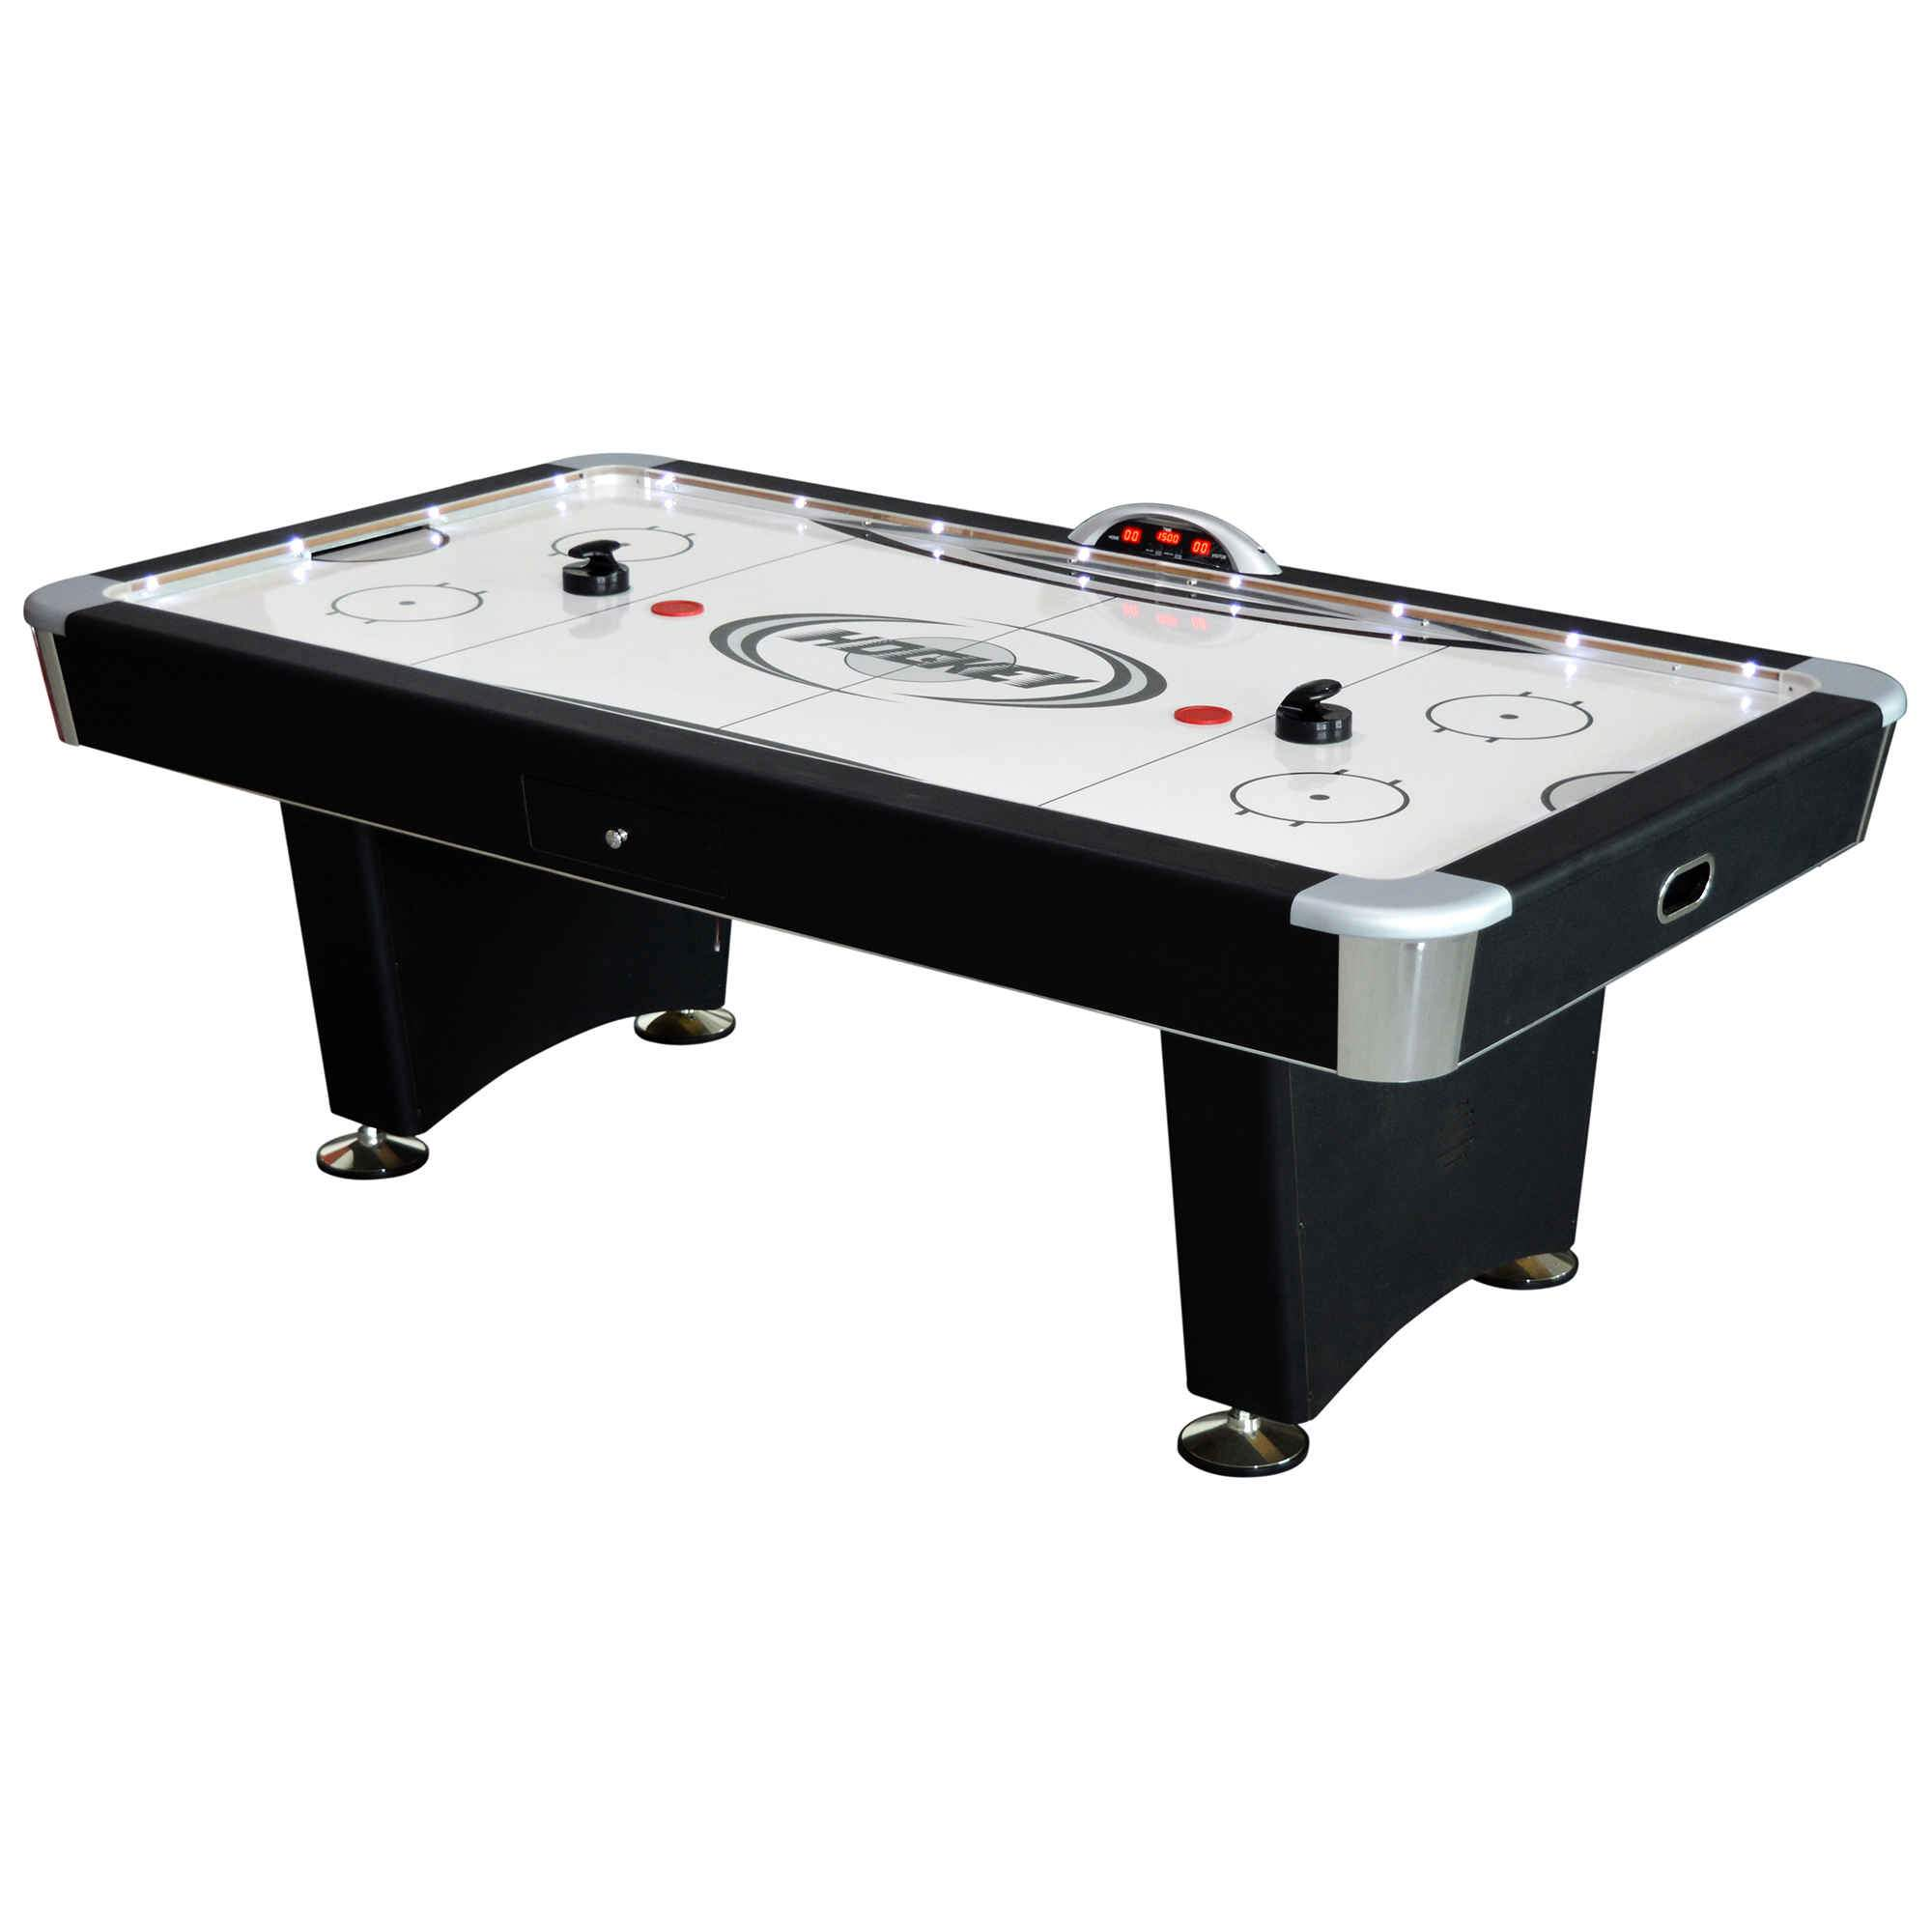 7 5 stratosphere air hockey table - Tournament air hockey table ...